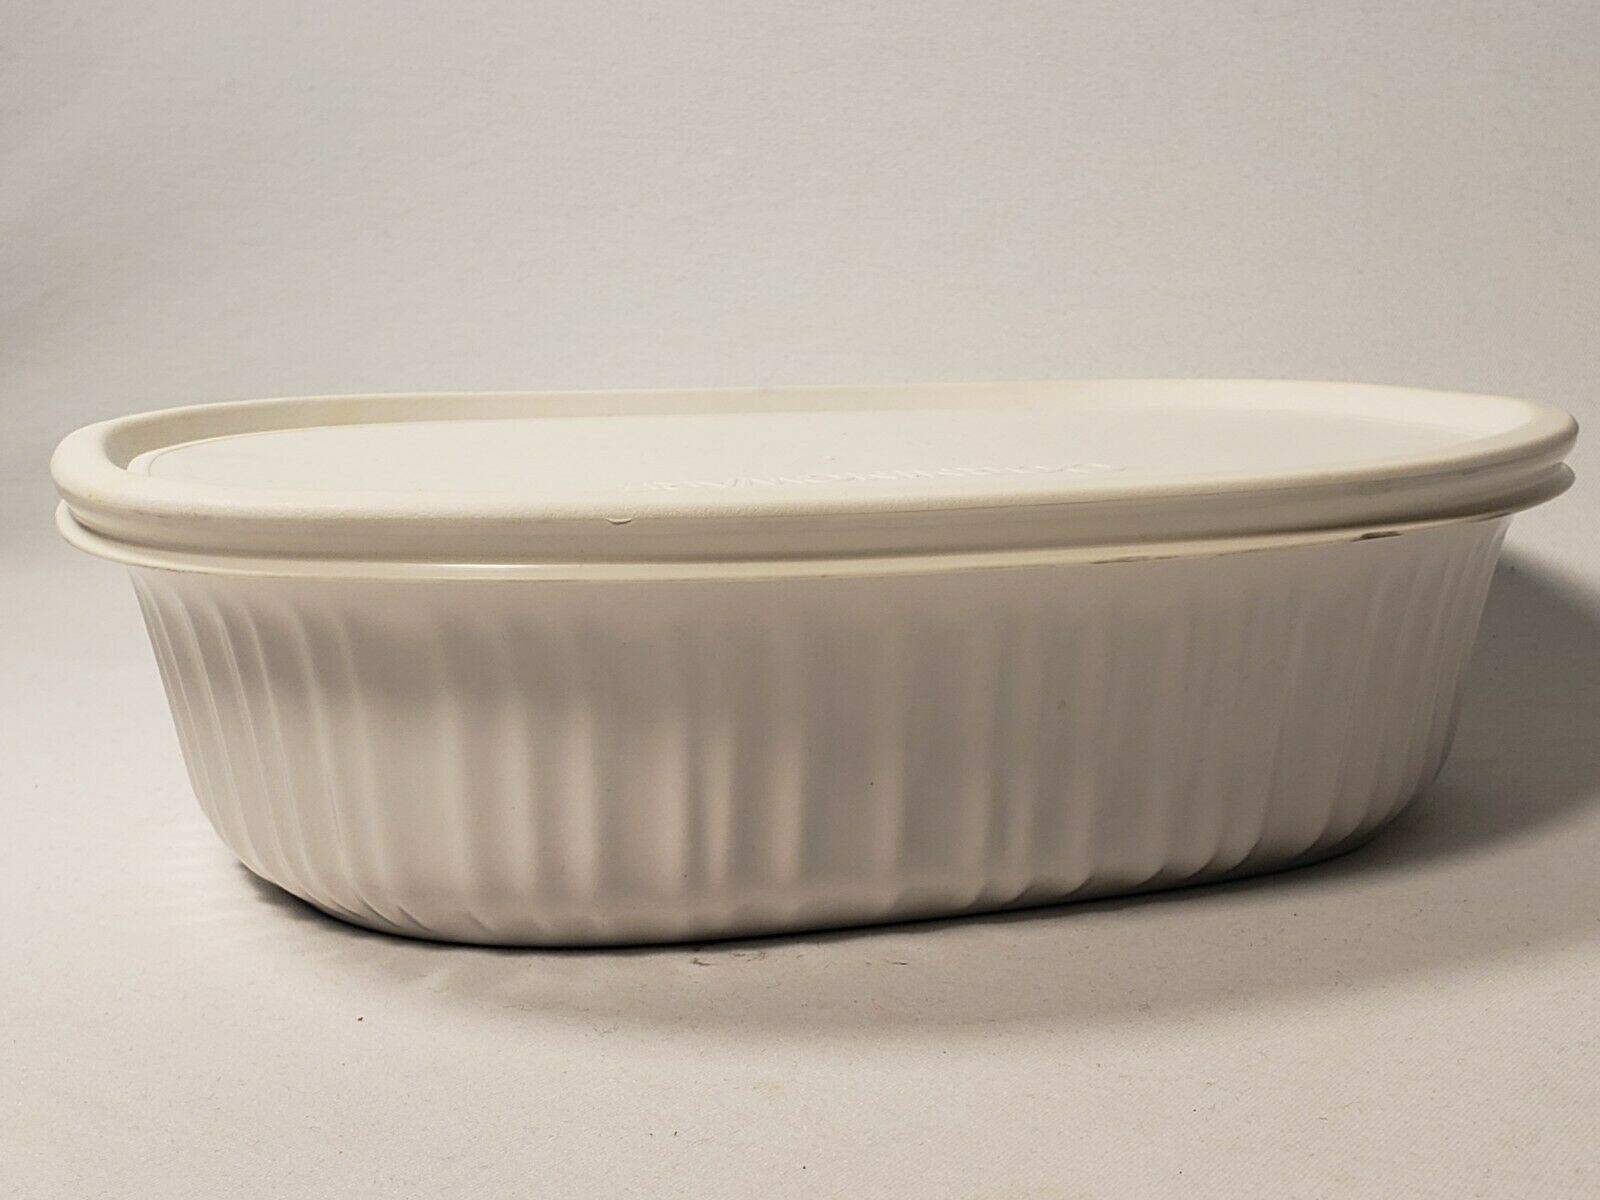 Corningware French White Oval Ceramic Bakeware 1-1/2 qt - 1.4 L Stoneware w/ Lid - $18.99